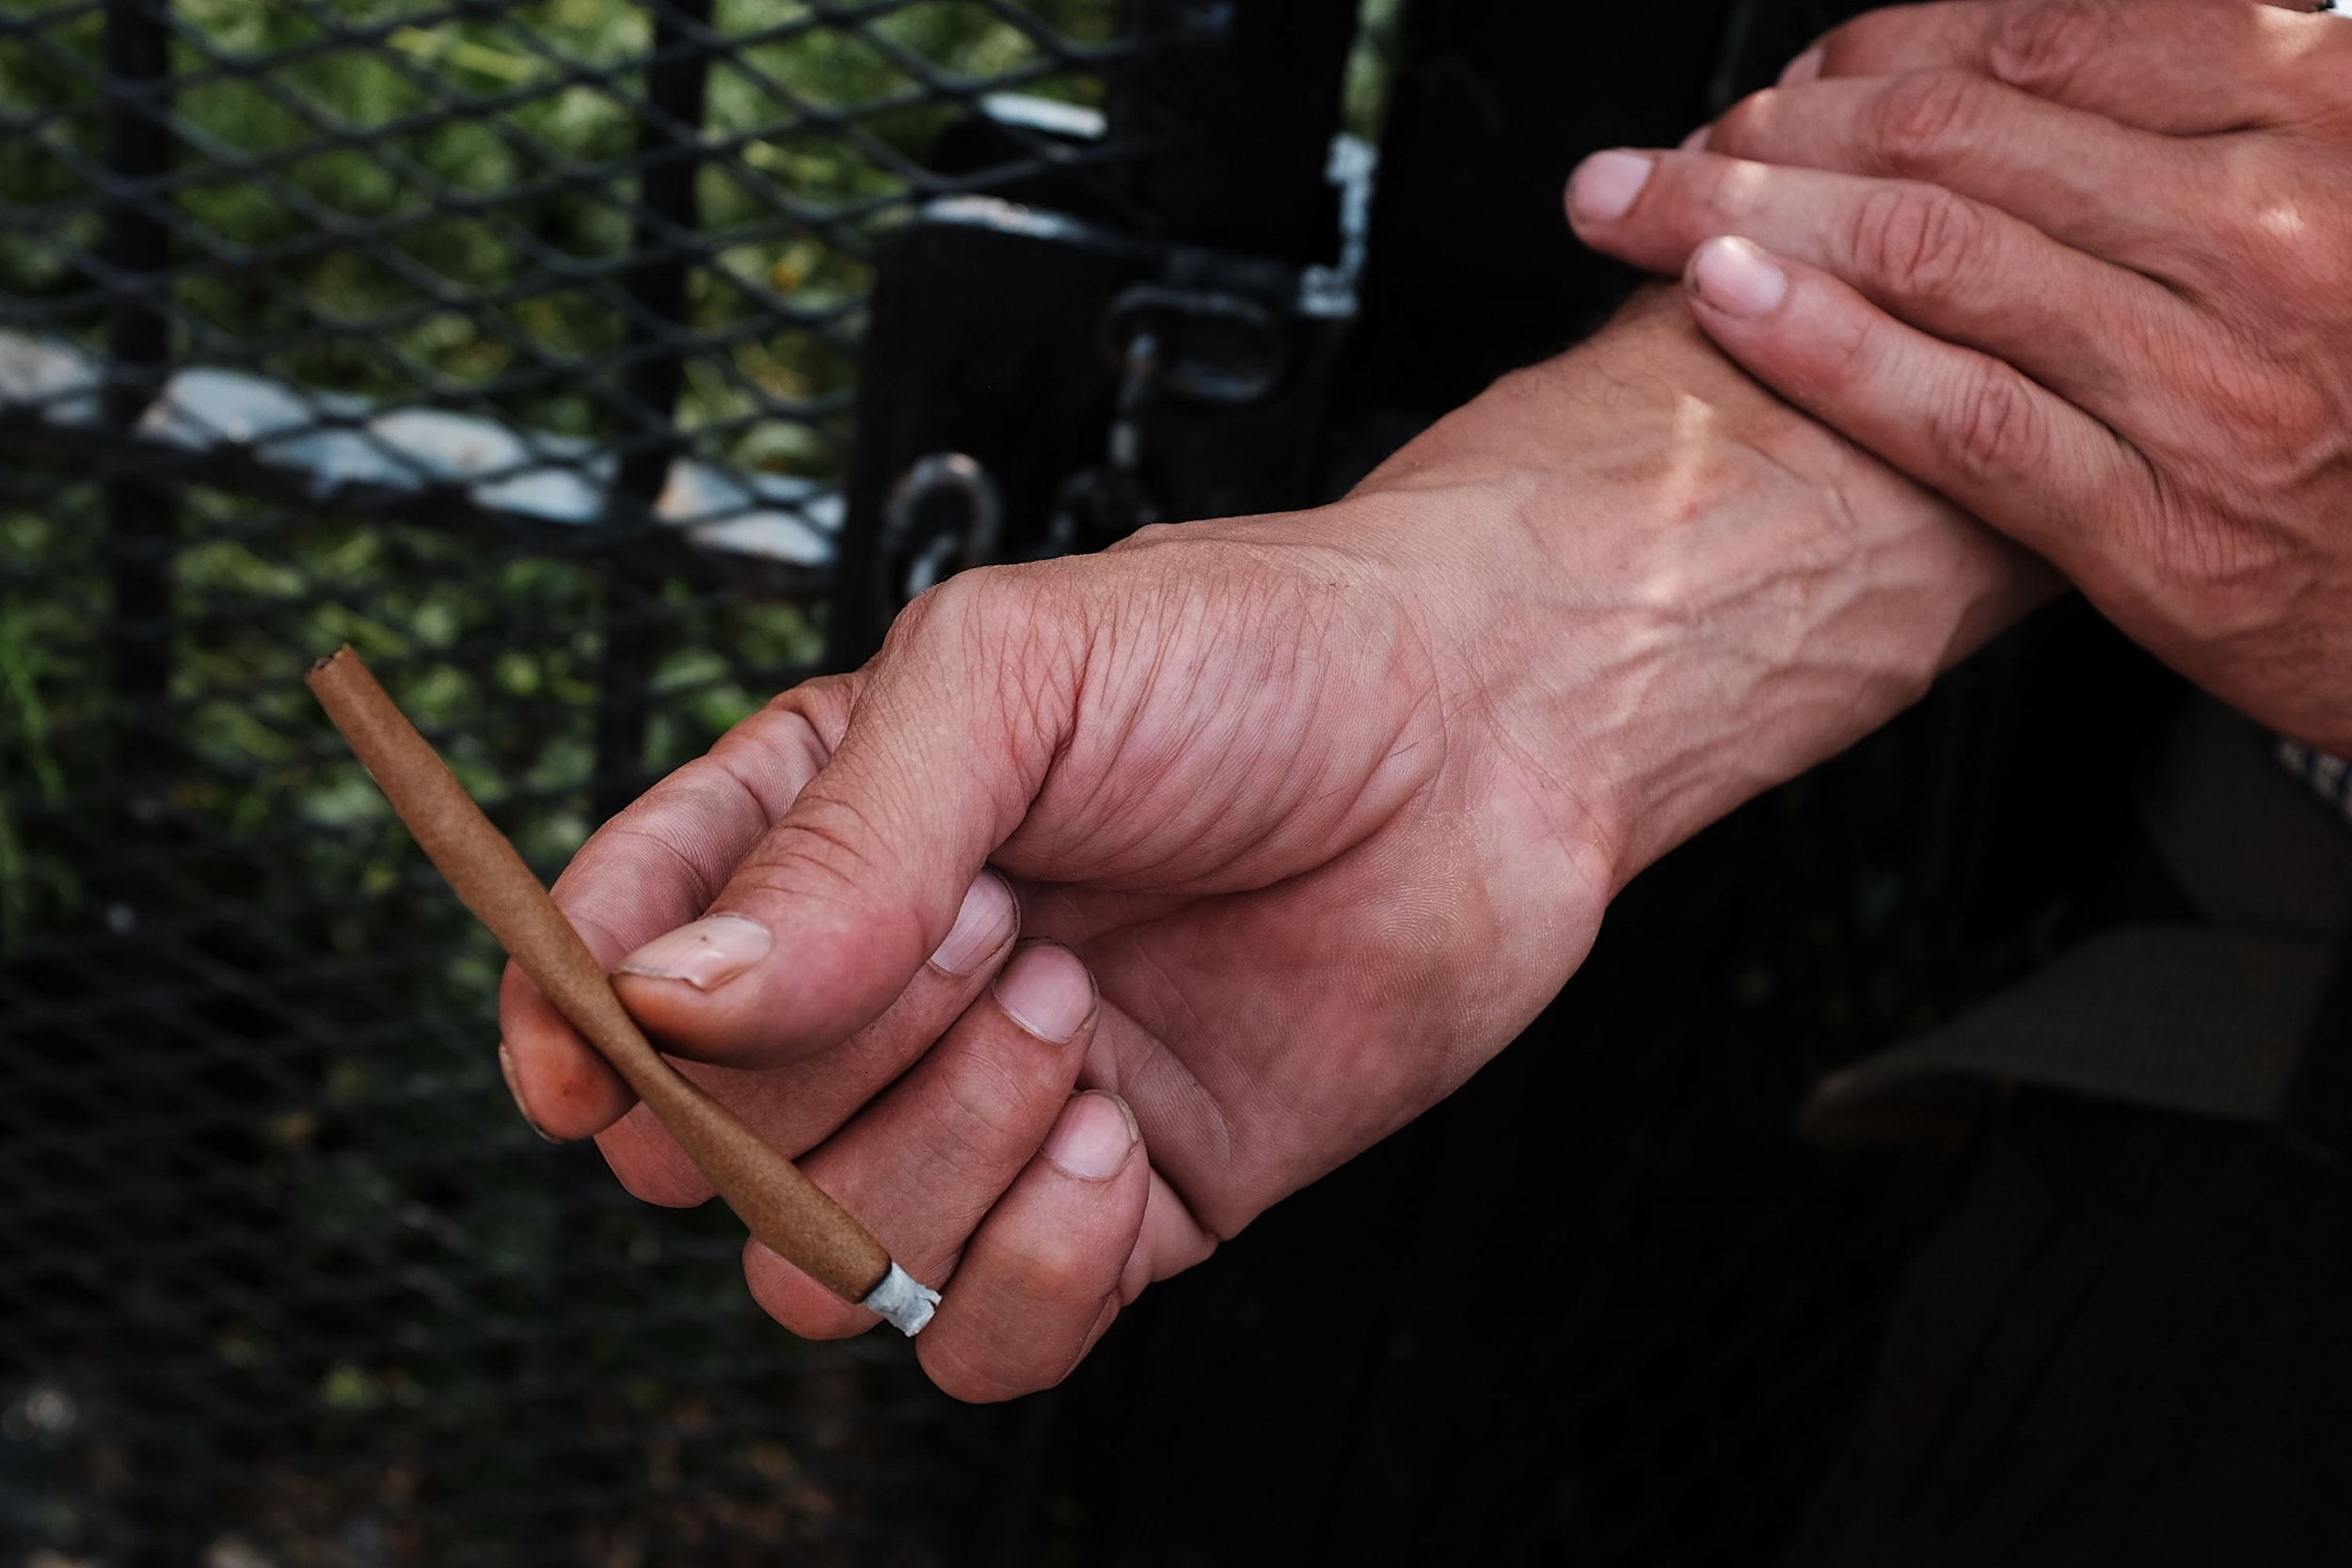 wisconsin synthetic cannabinoids rat poisoning severe bleeding